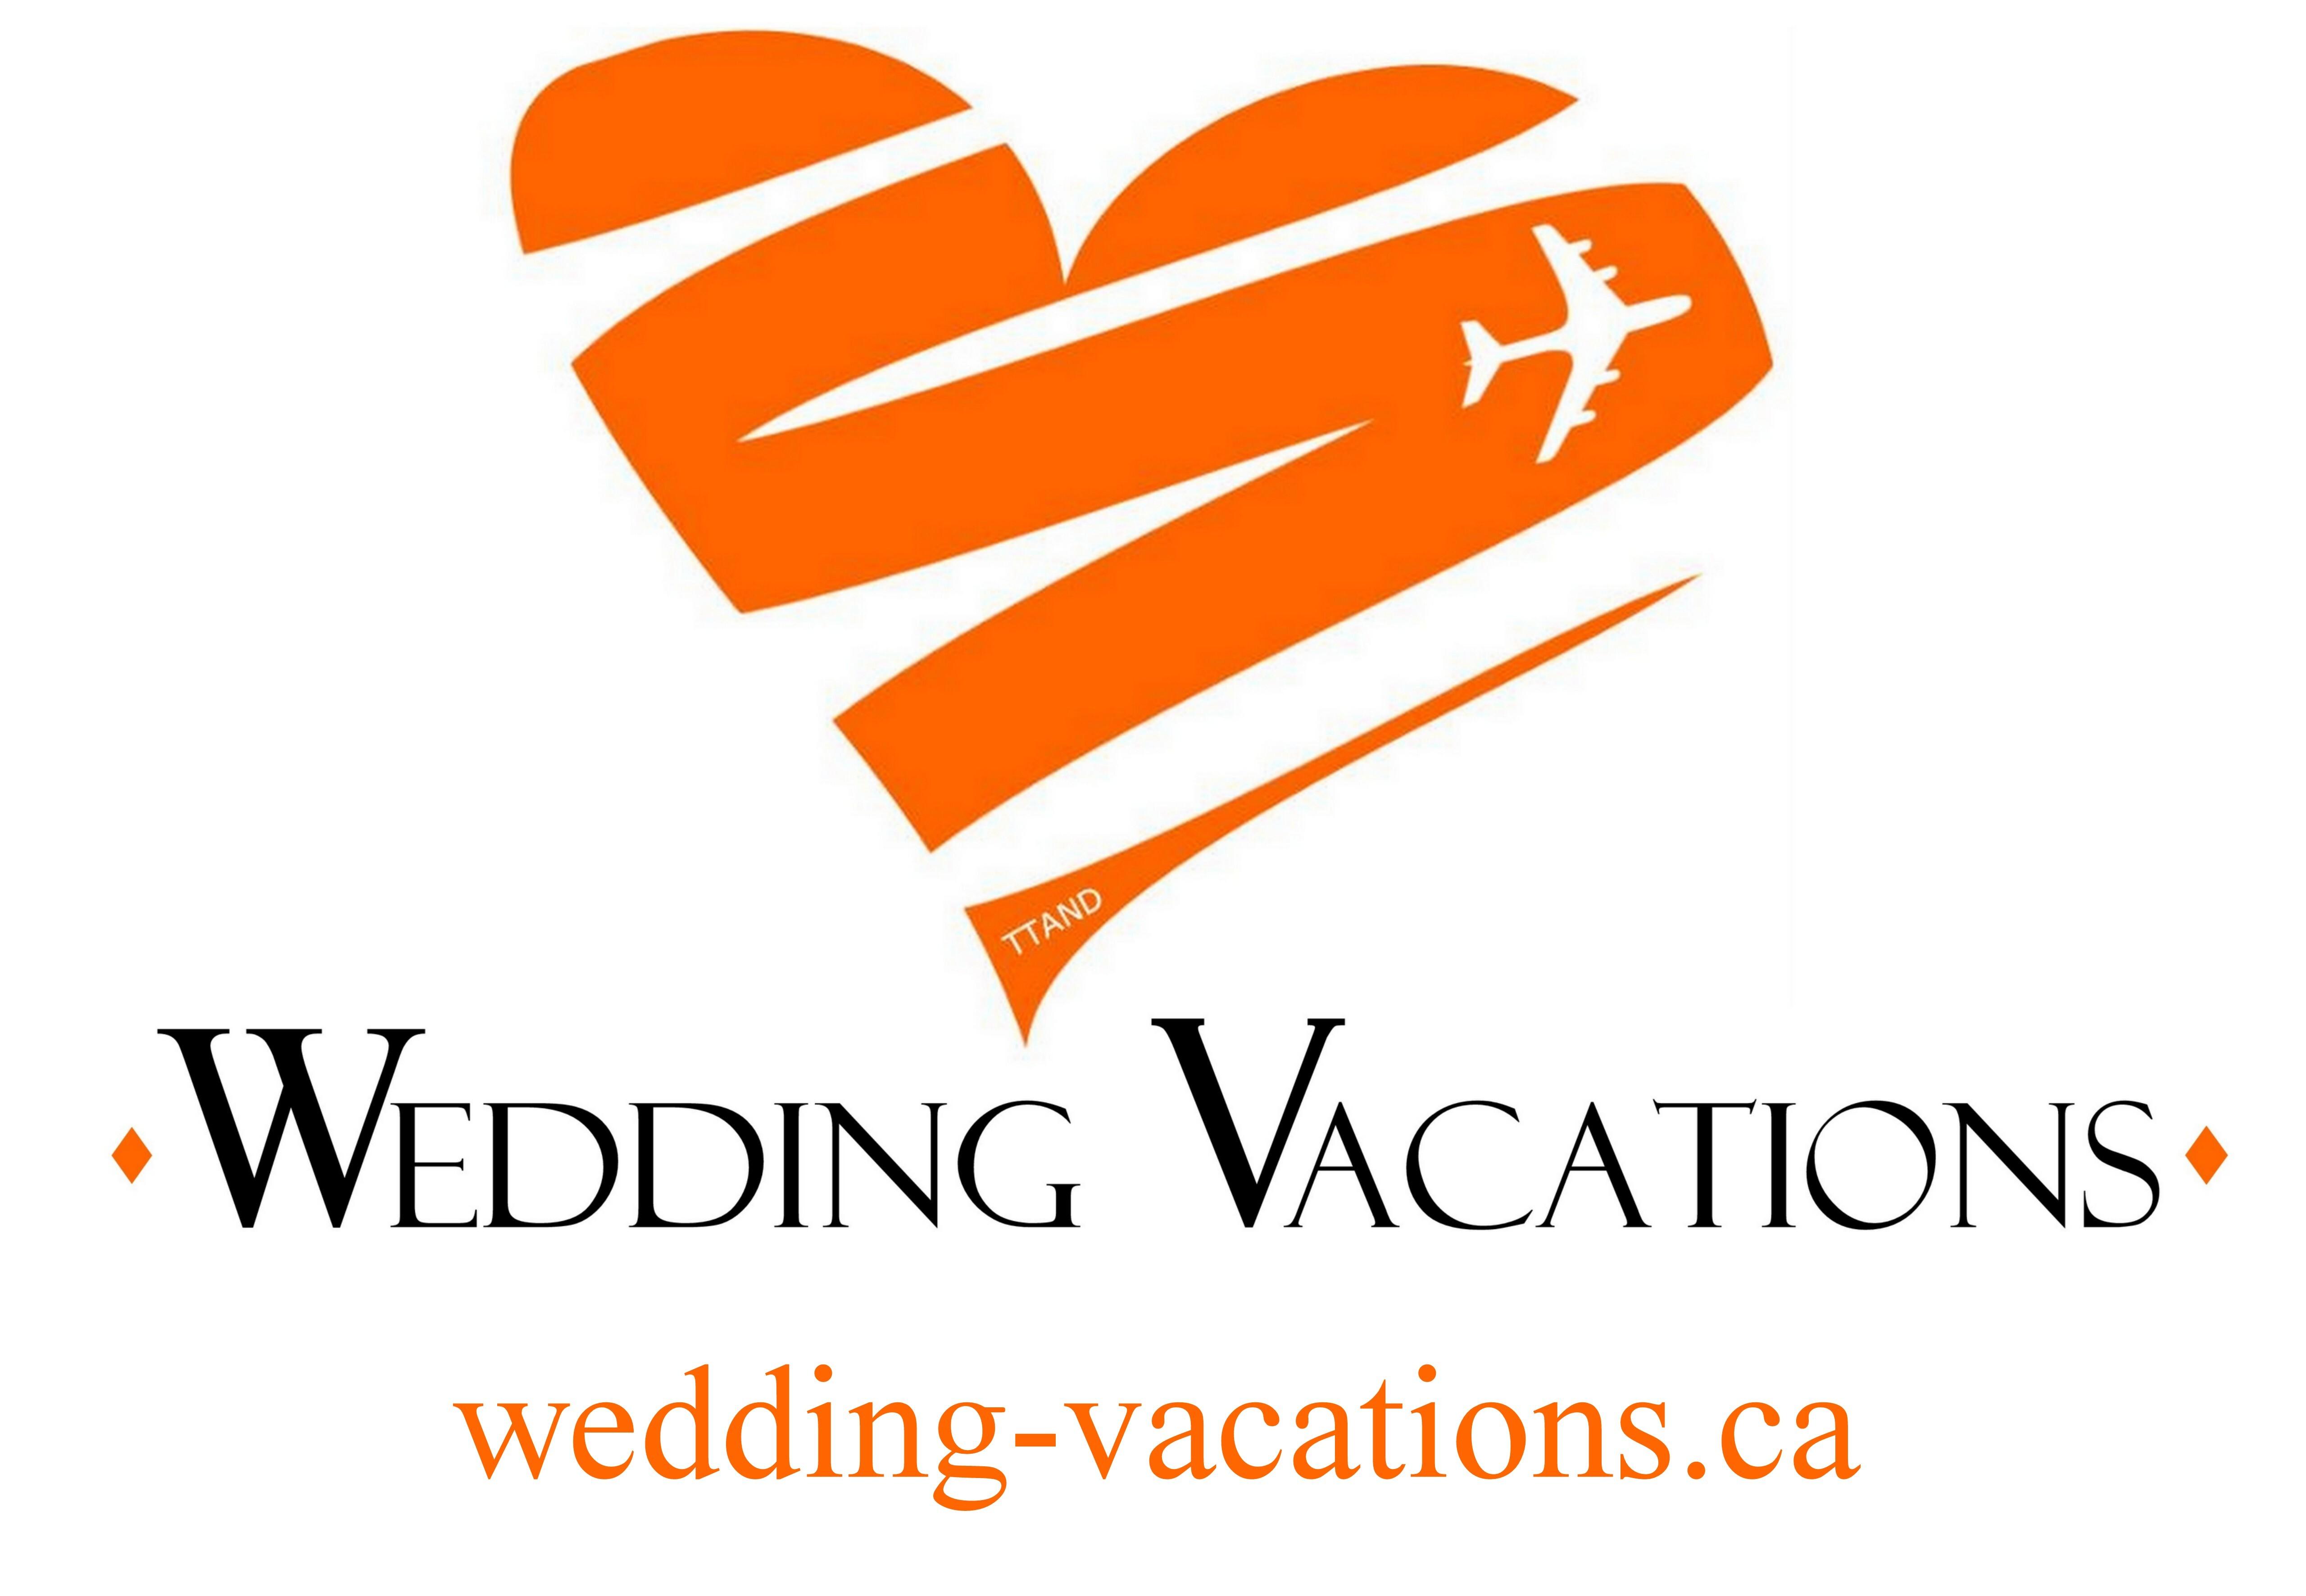 Honeymoon wedding-vacations.ca